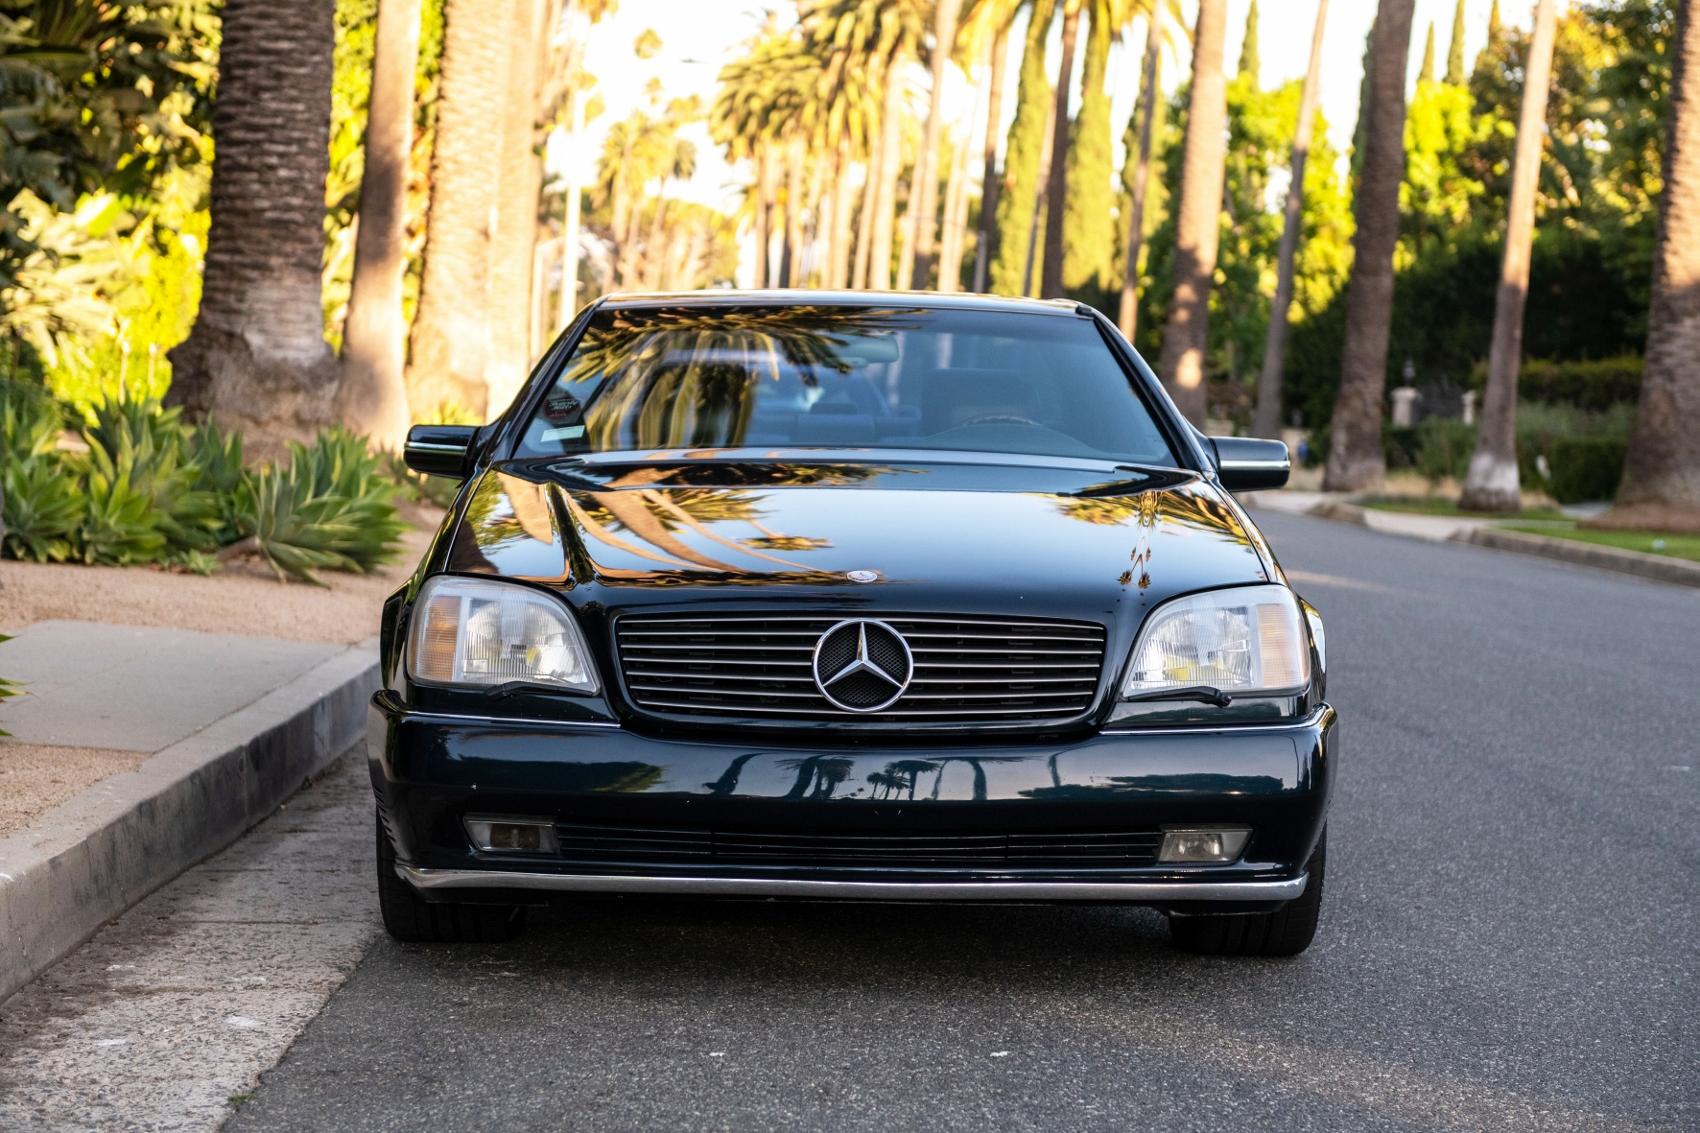 Pozrite si Mercedes S600 Michaela Jordana z roku 1996 l5yiDKmgvq lorinsercl600ex-jordanfront1sbeverl